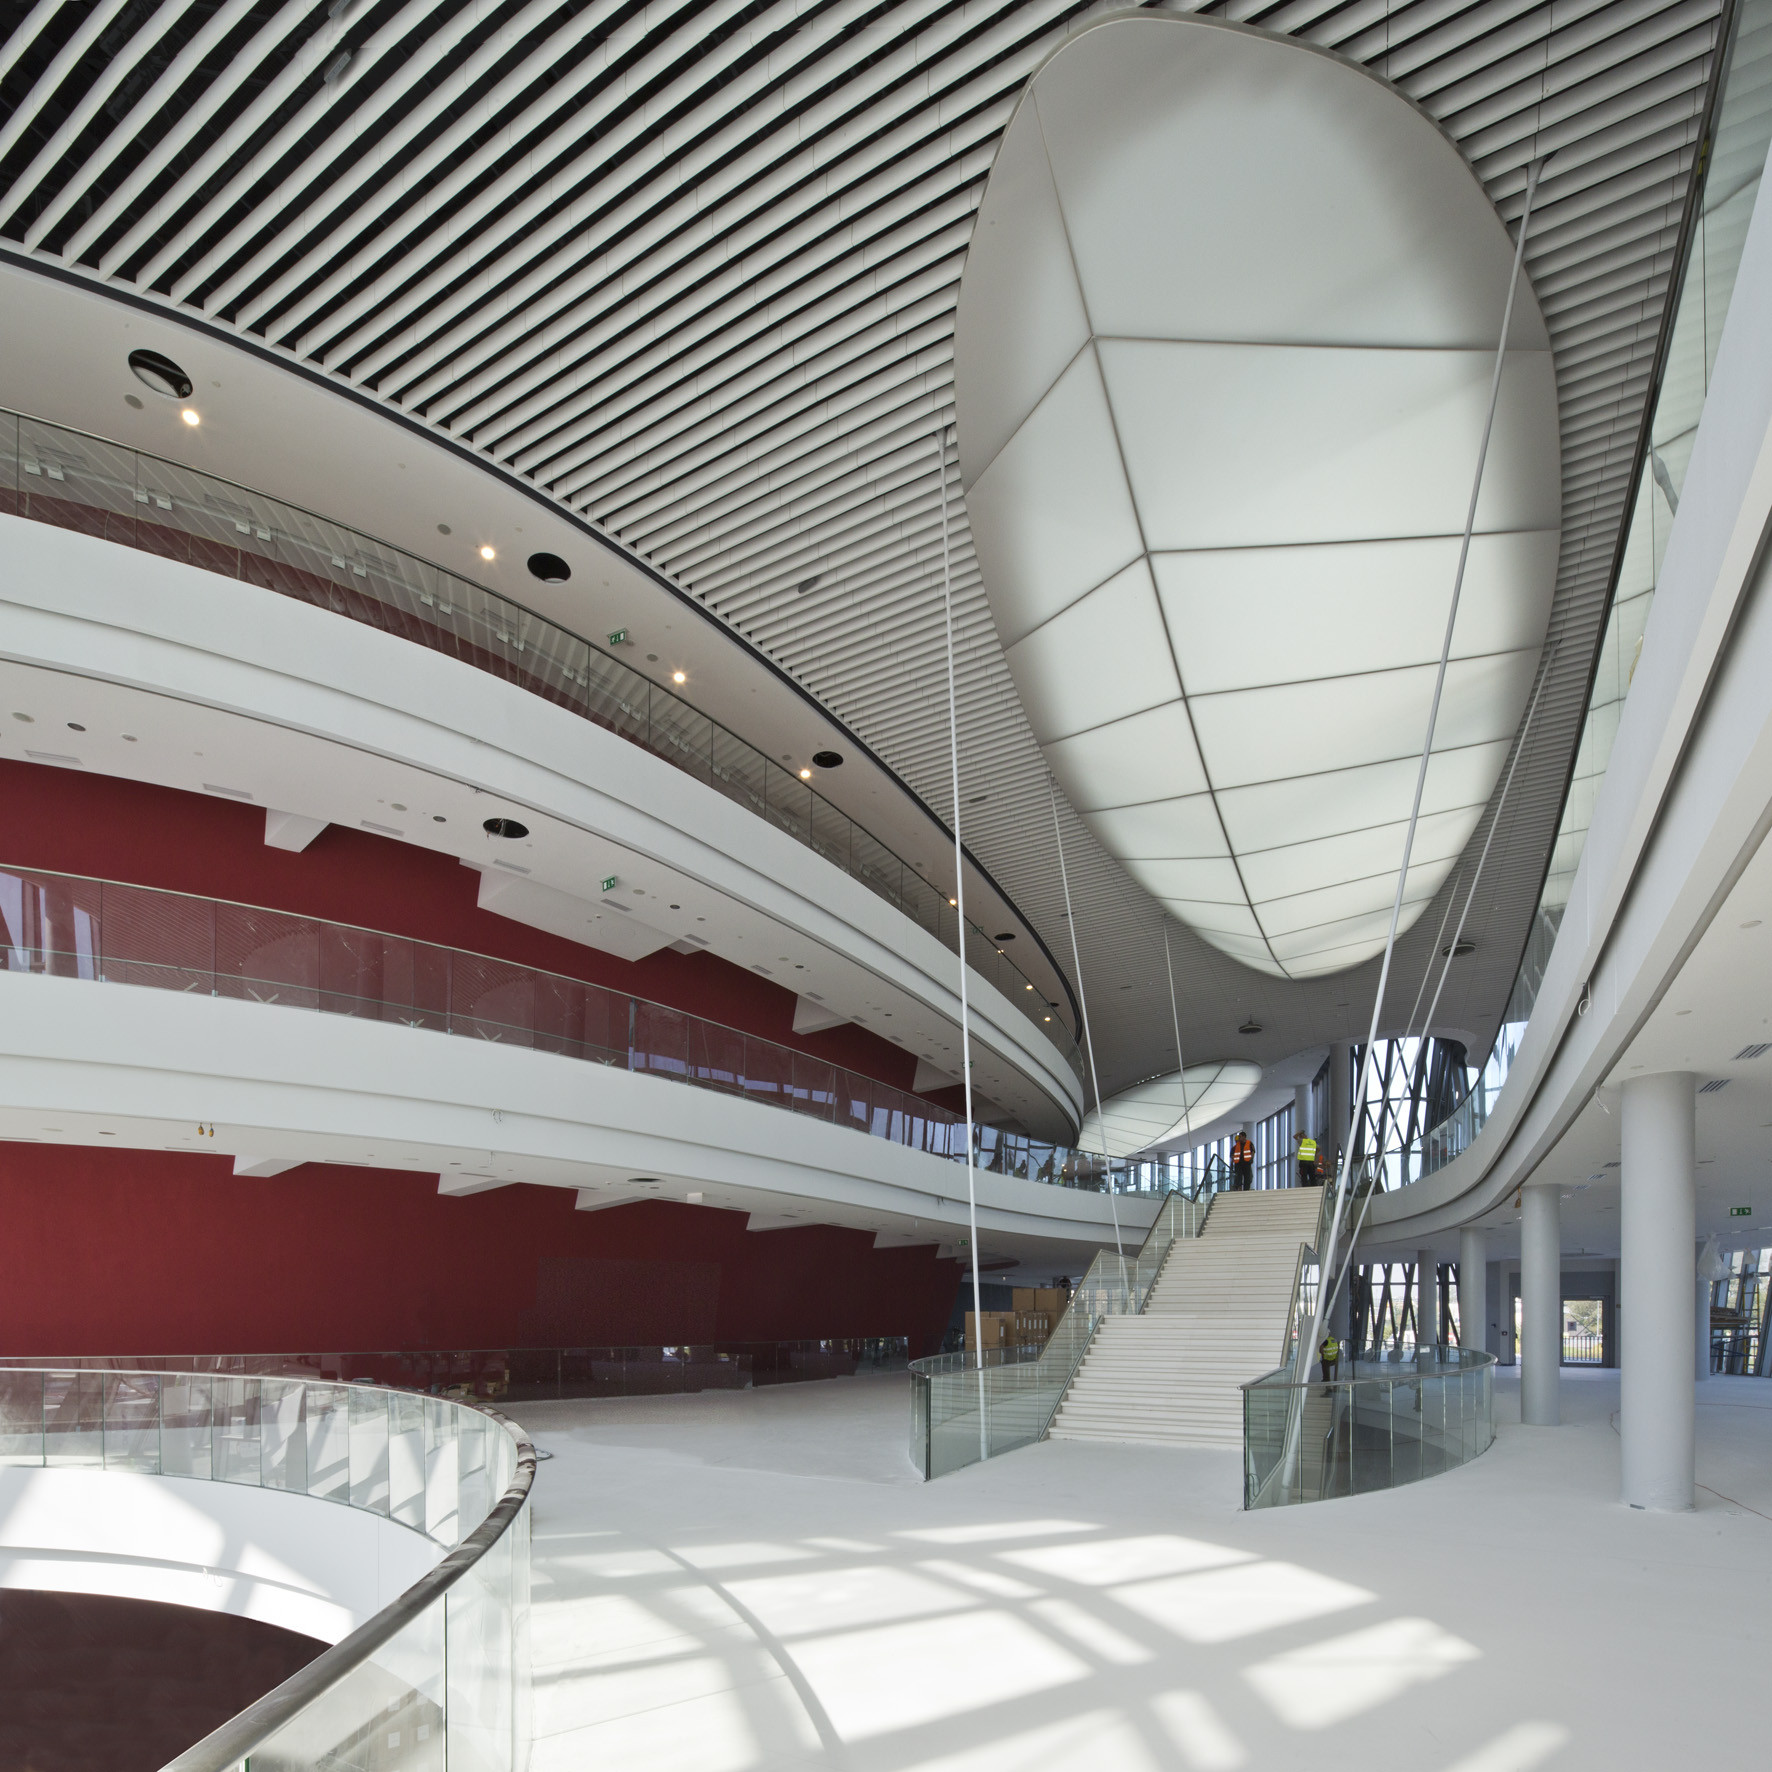 Ice Kraków Congress Centre / IEA + Arata Isozaki & Associates, Courtesy of Ingarden & Ewý Architects + Arata Isozaki & Associates